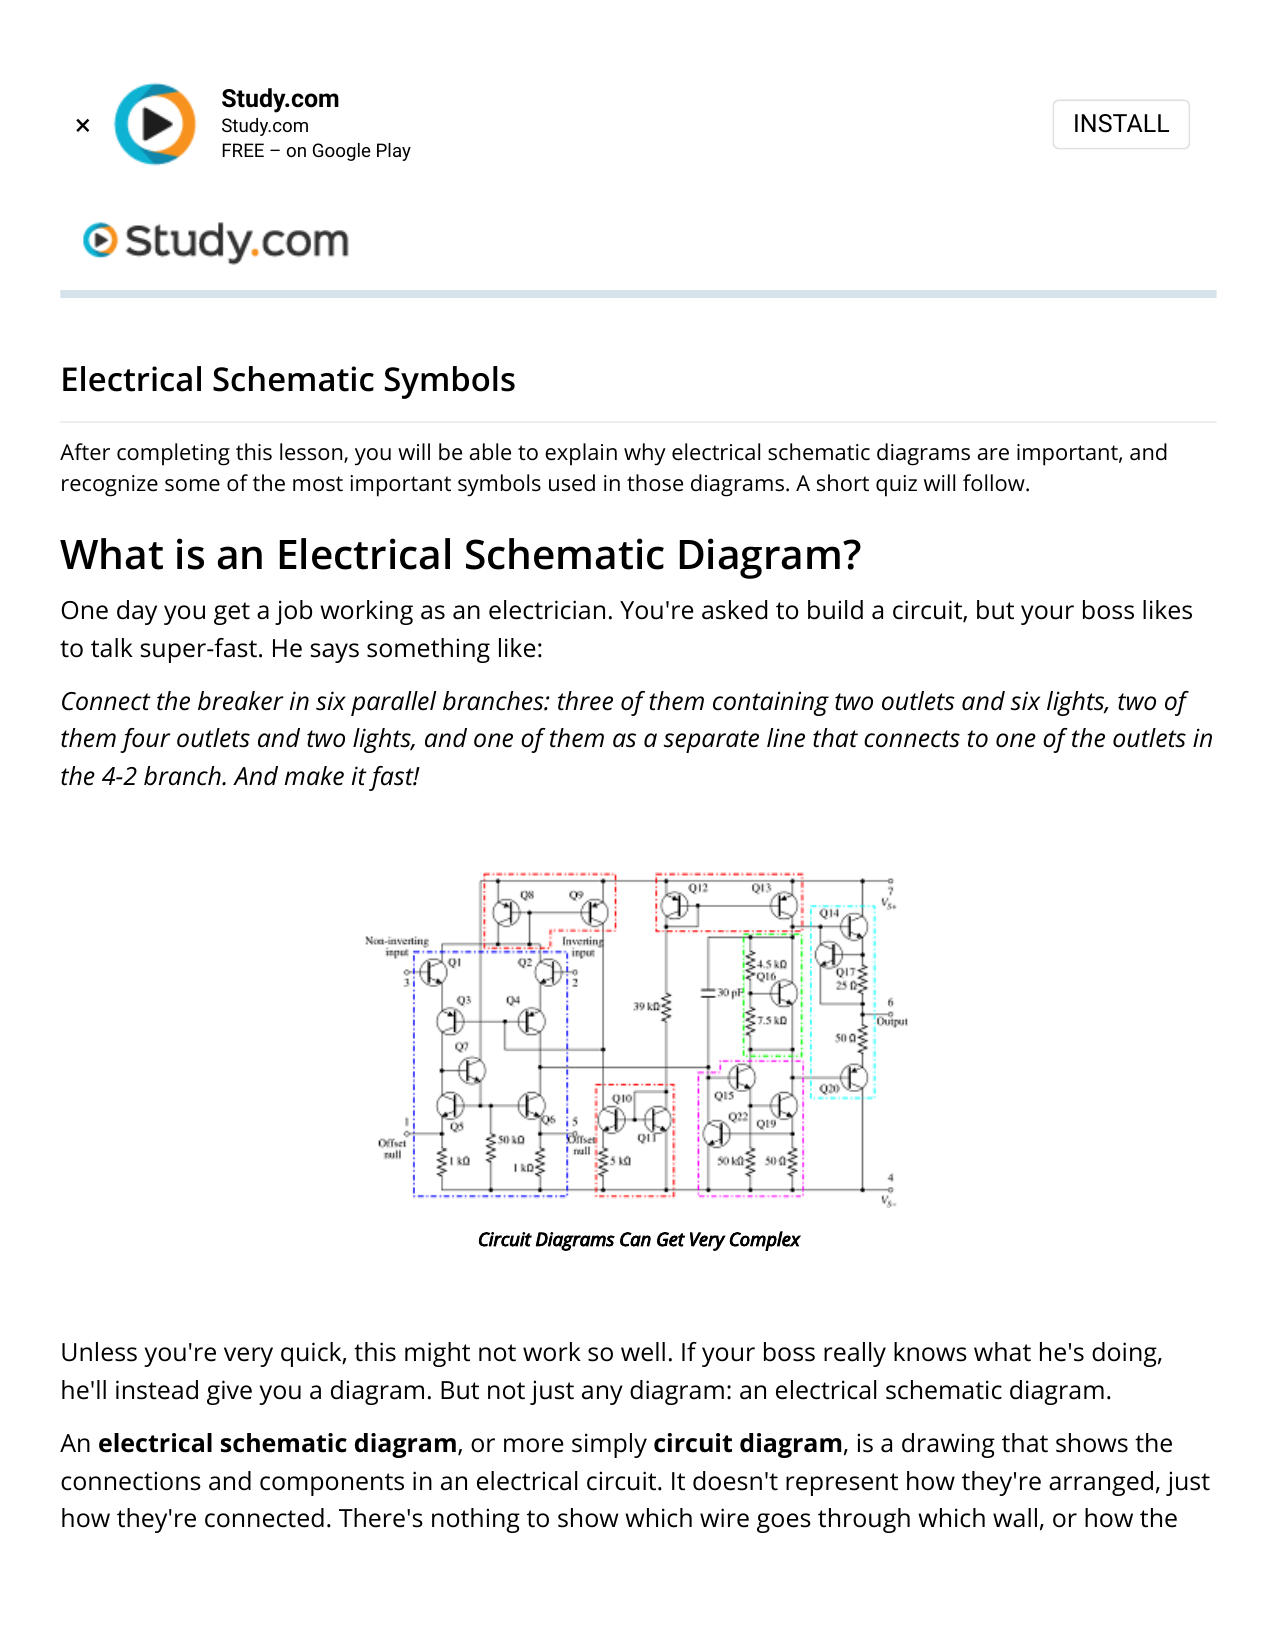 Electrical Schematic Symbols   Study.com [ 1651 x 1275 Pixel ]